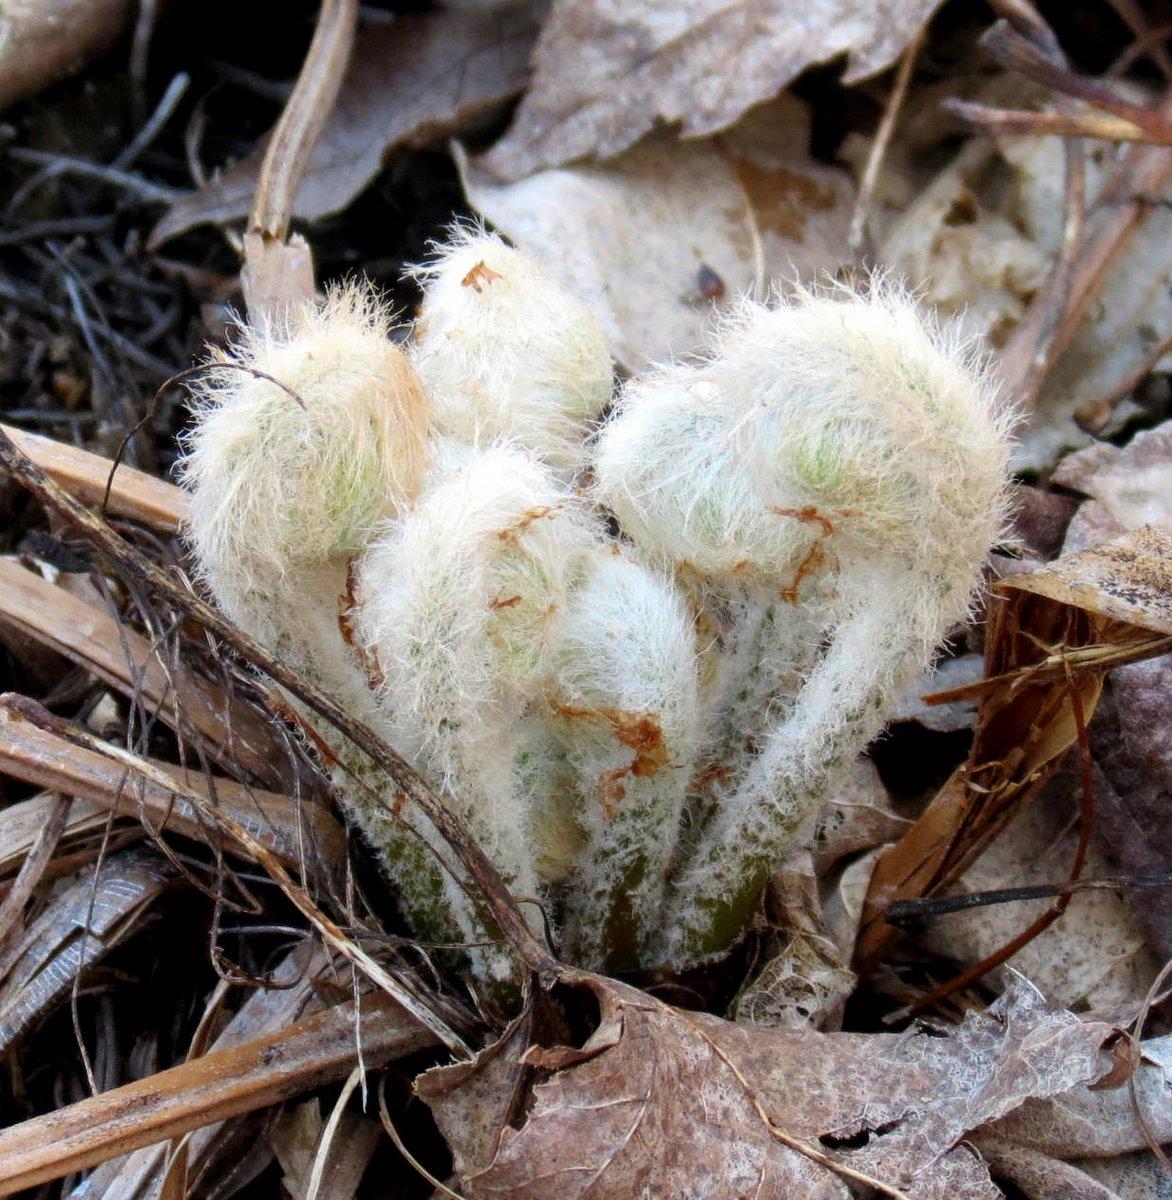 4. Furry Fiddleheads